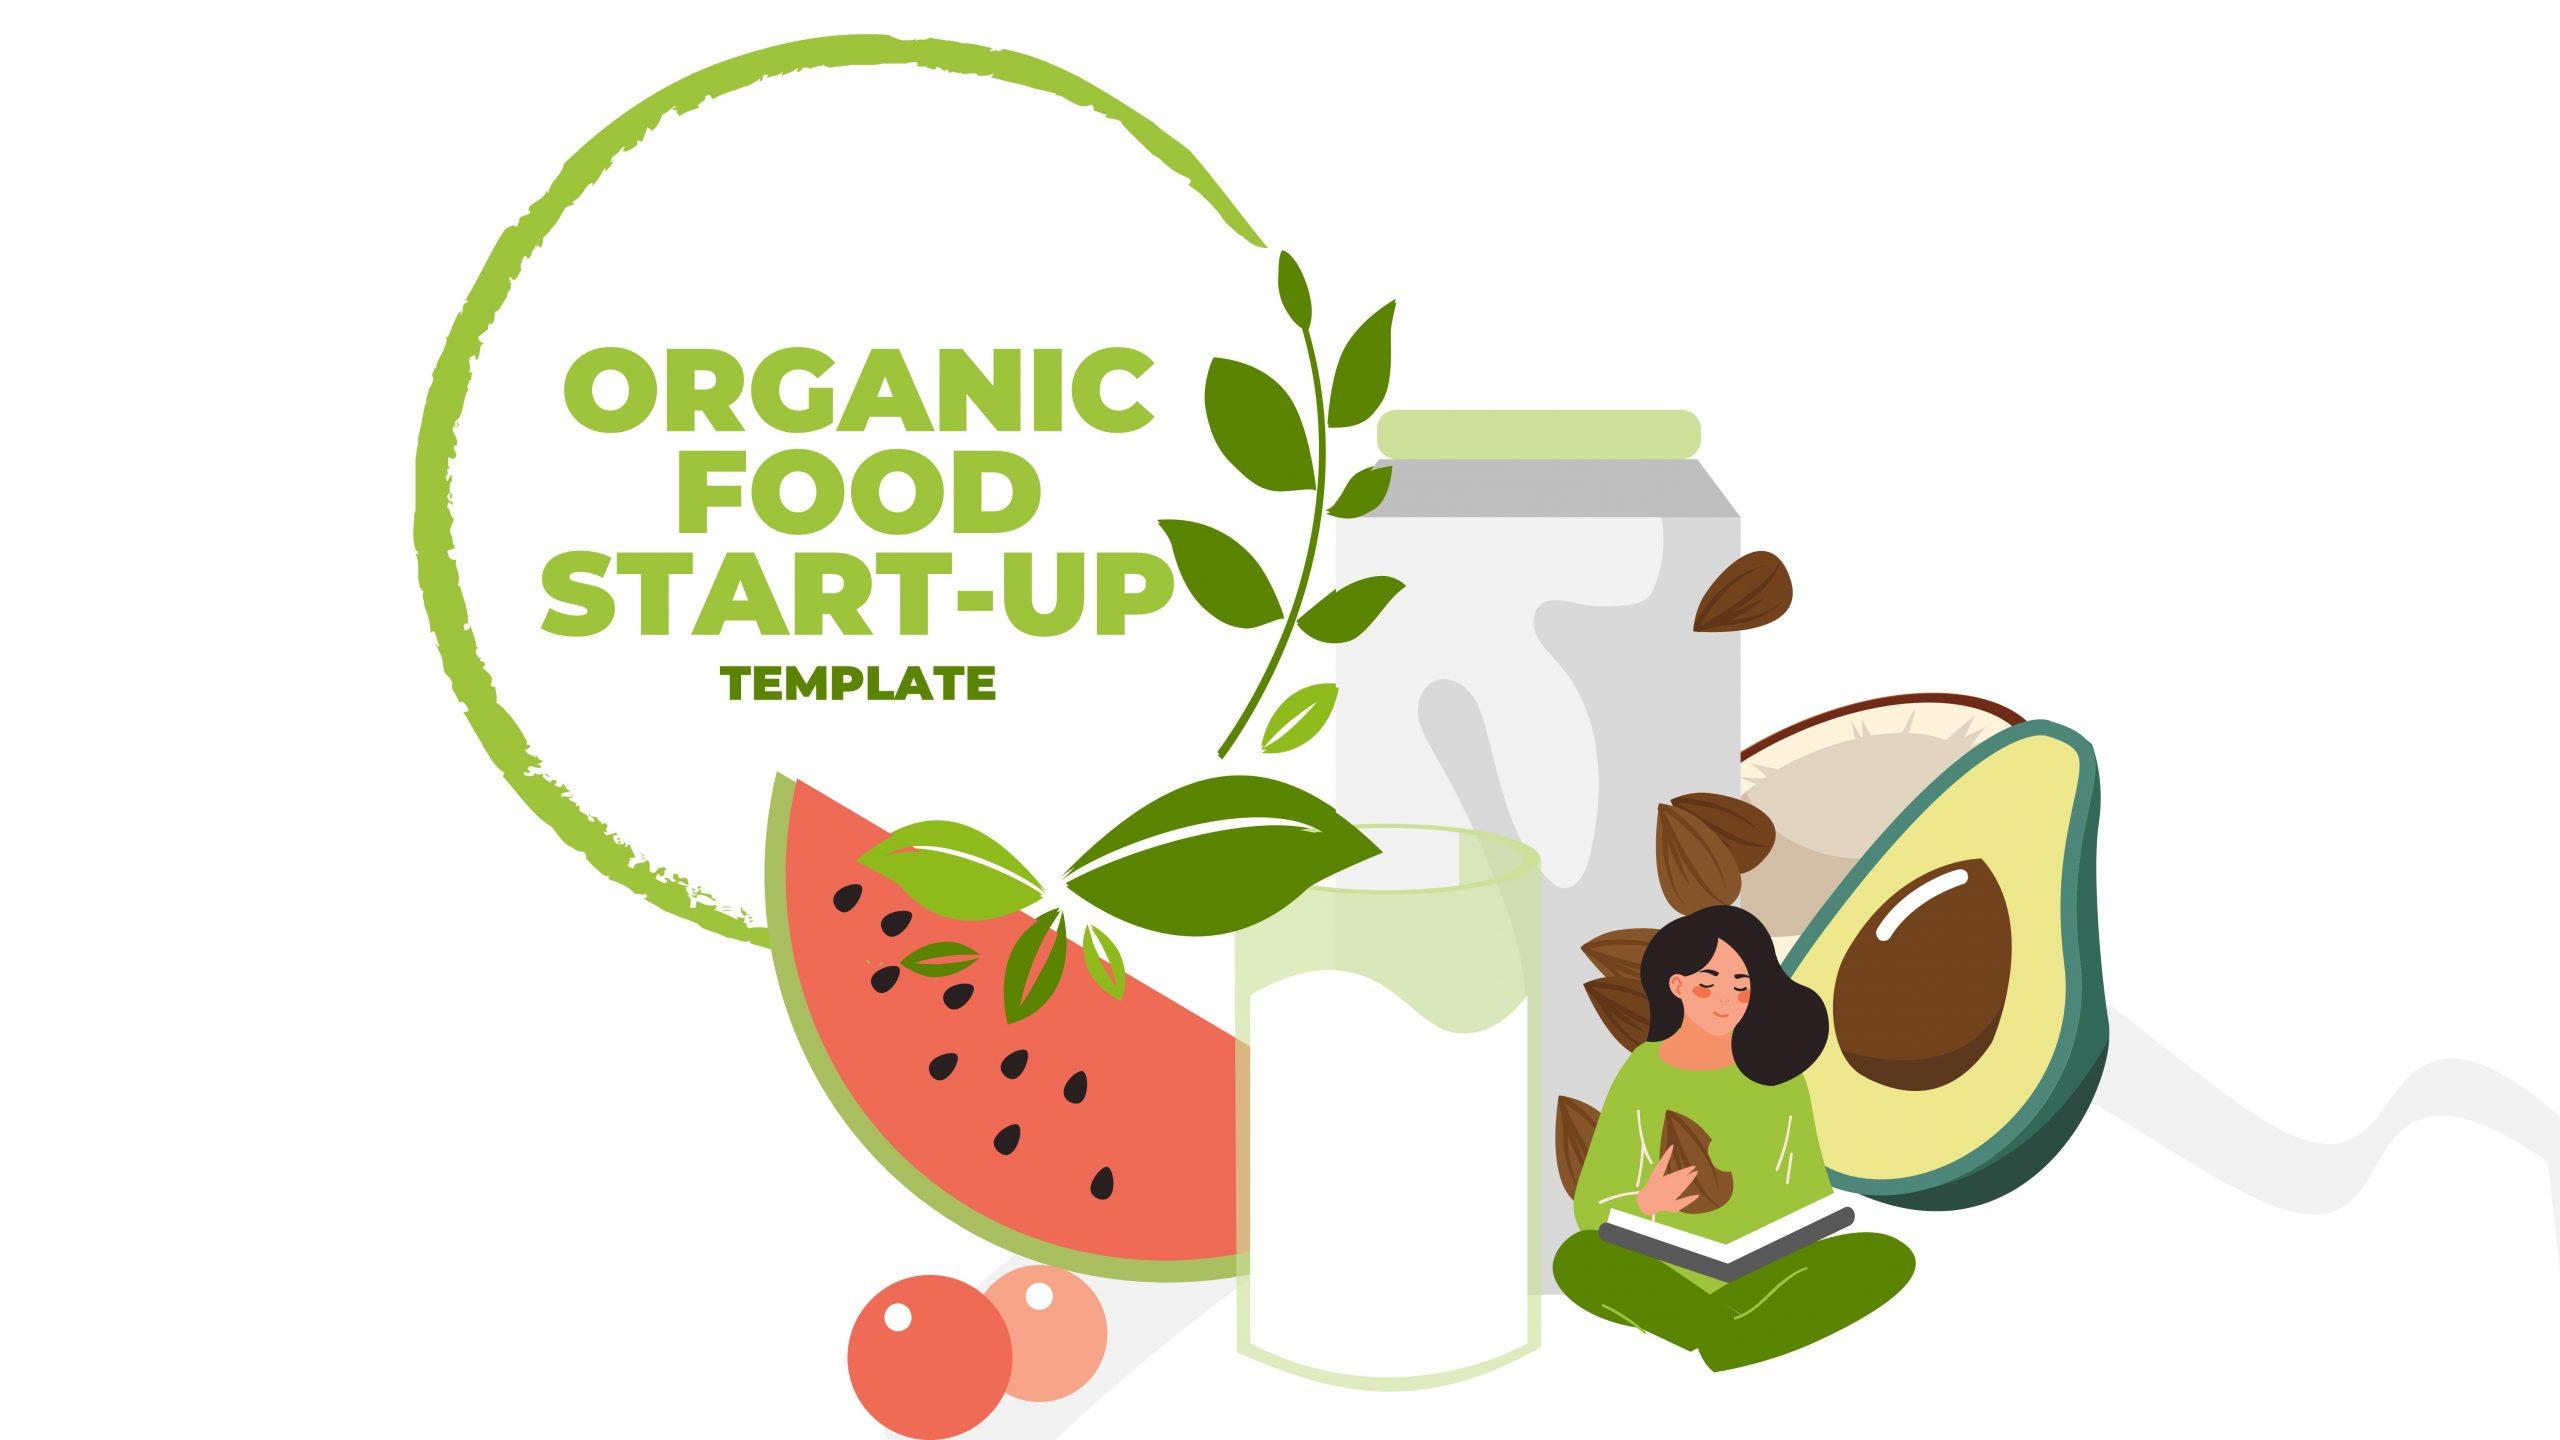 Free presentation template of Organic Food